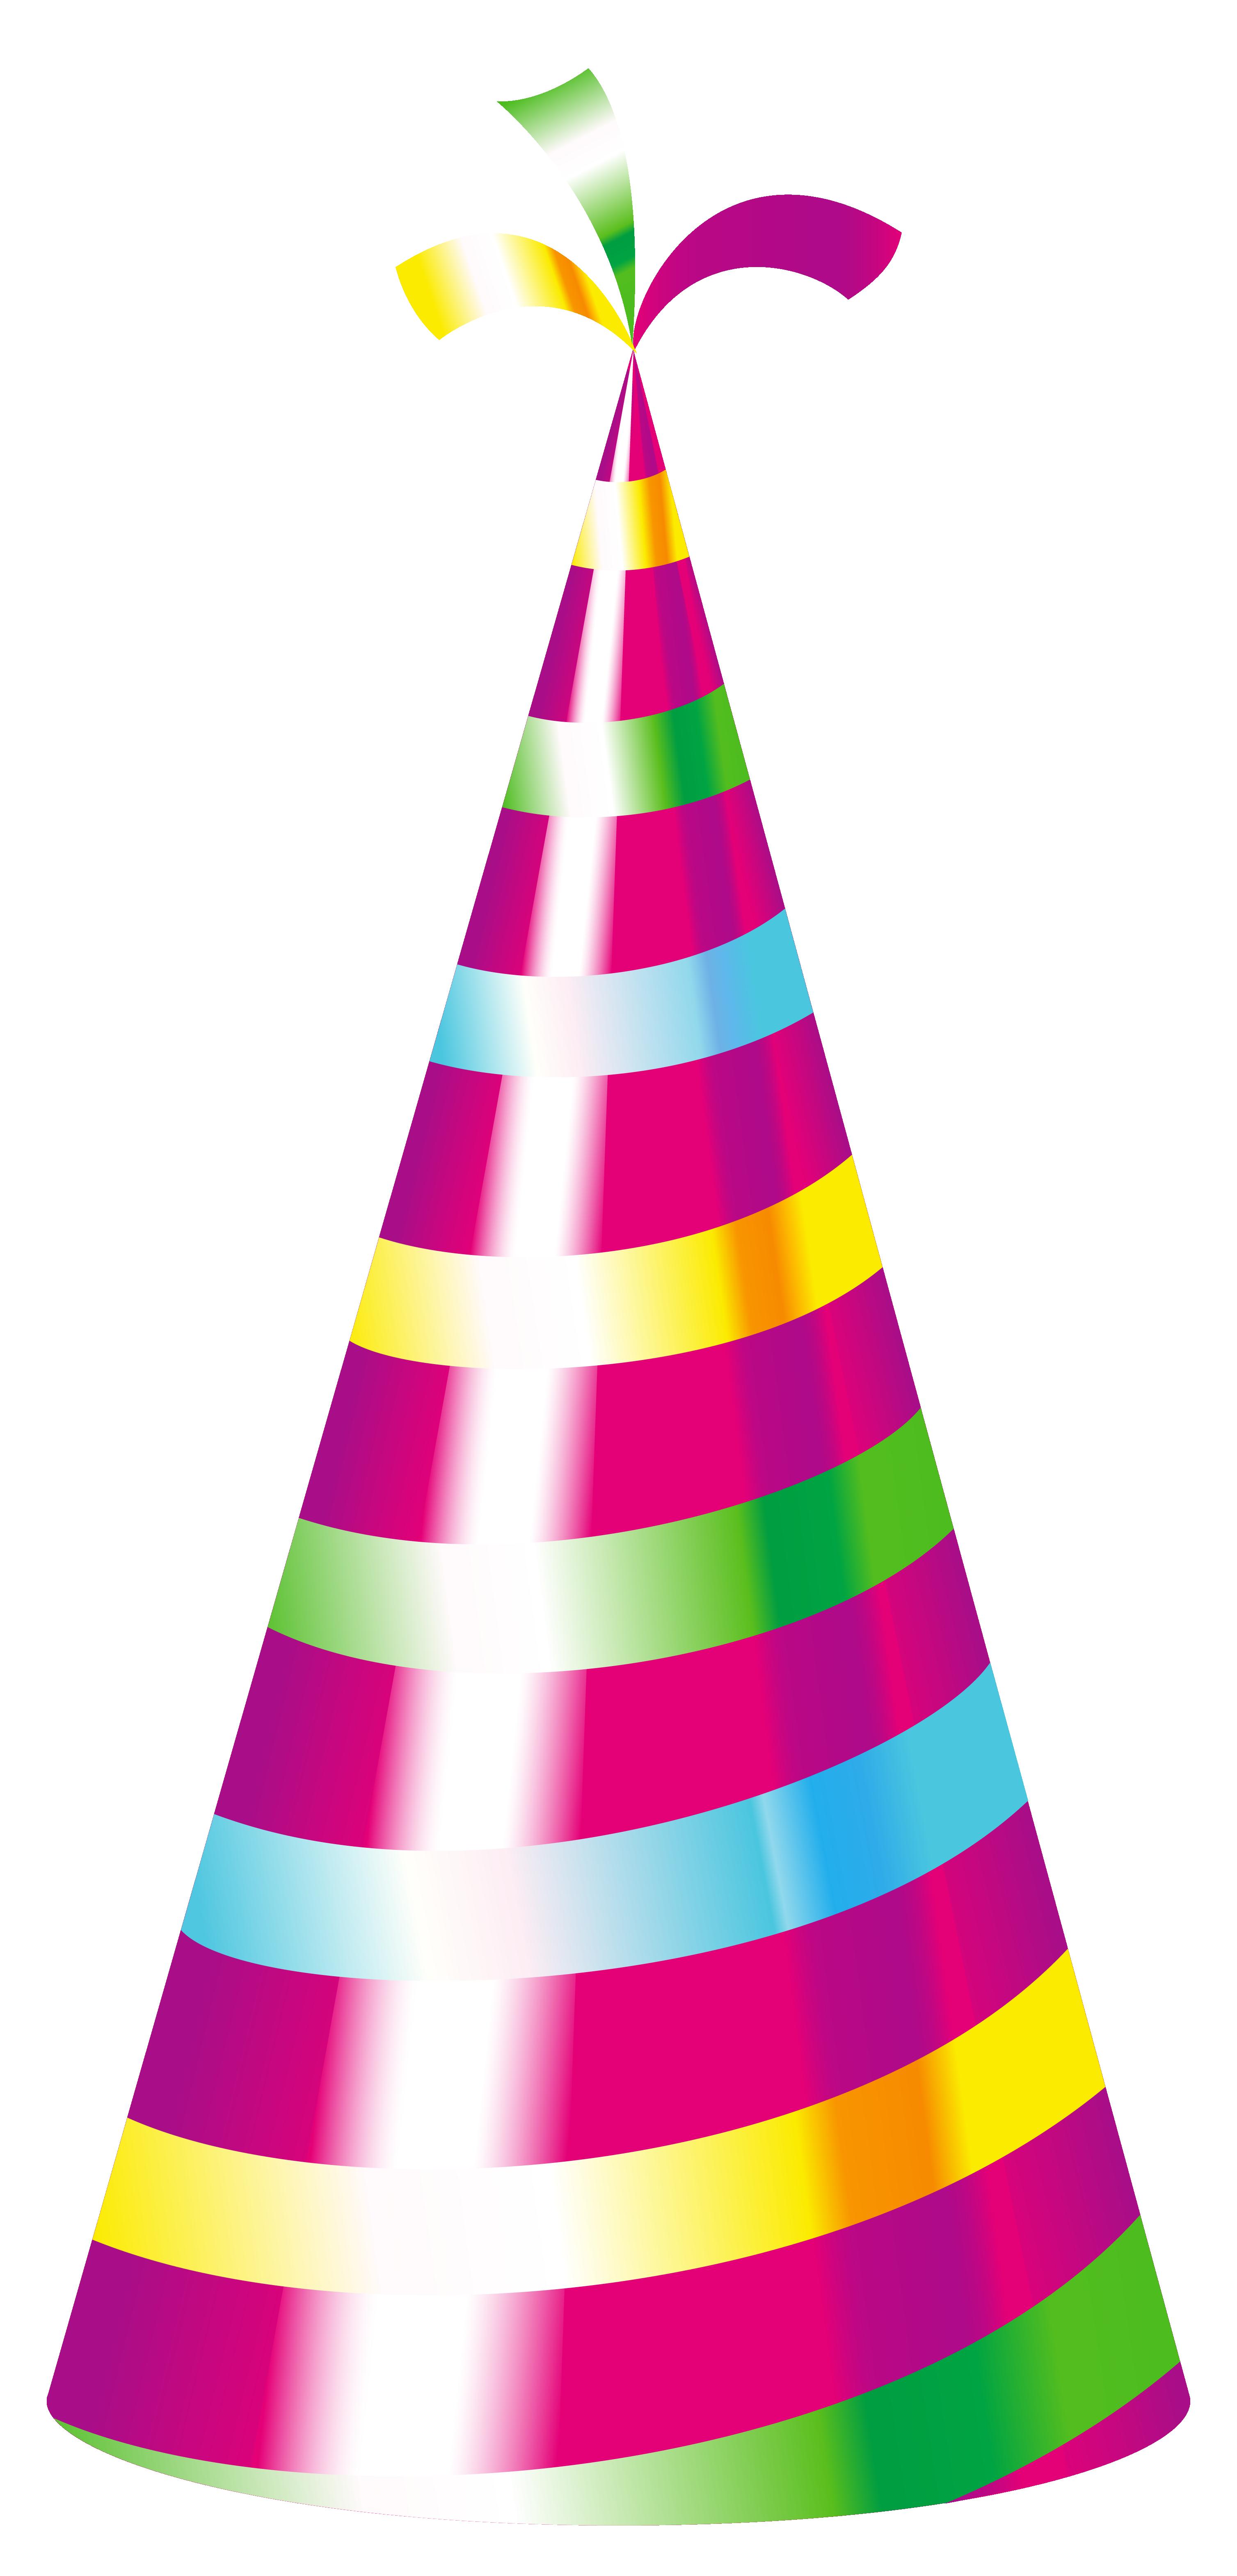 3015x6279 Birthday Hat Clipart No Background